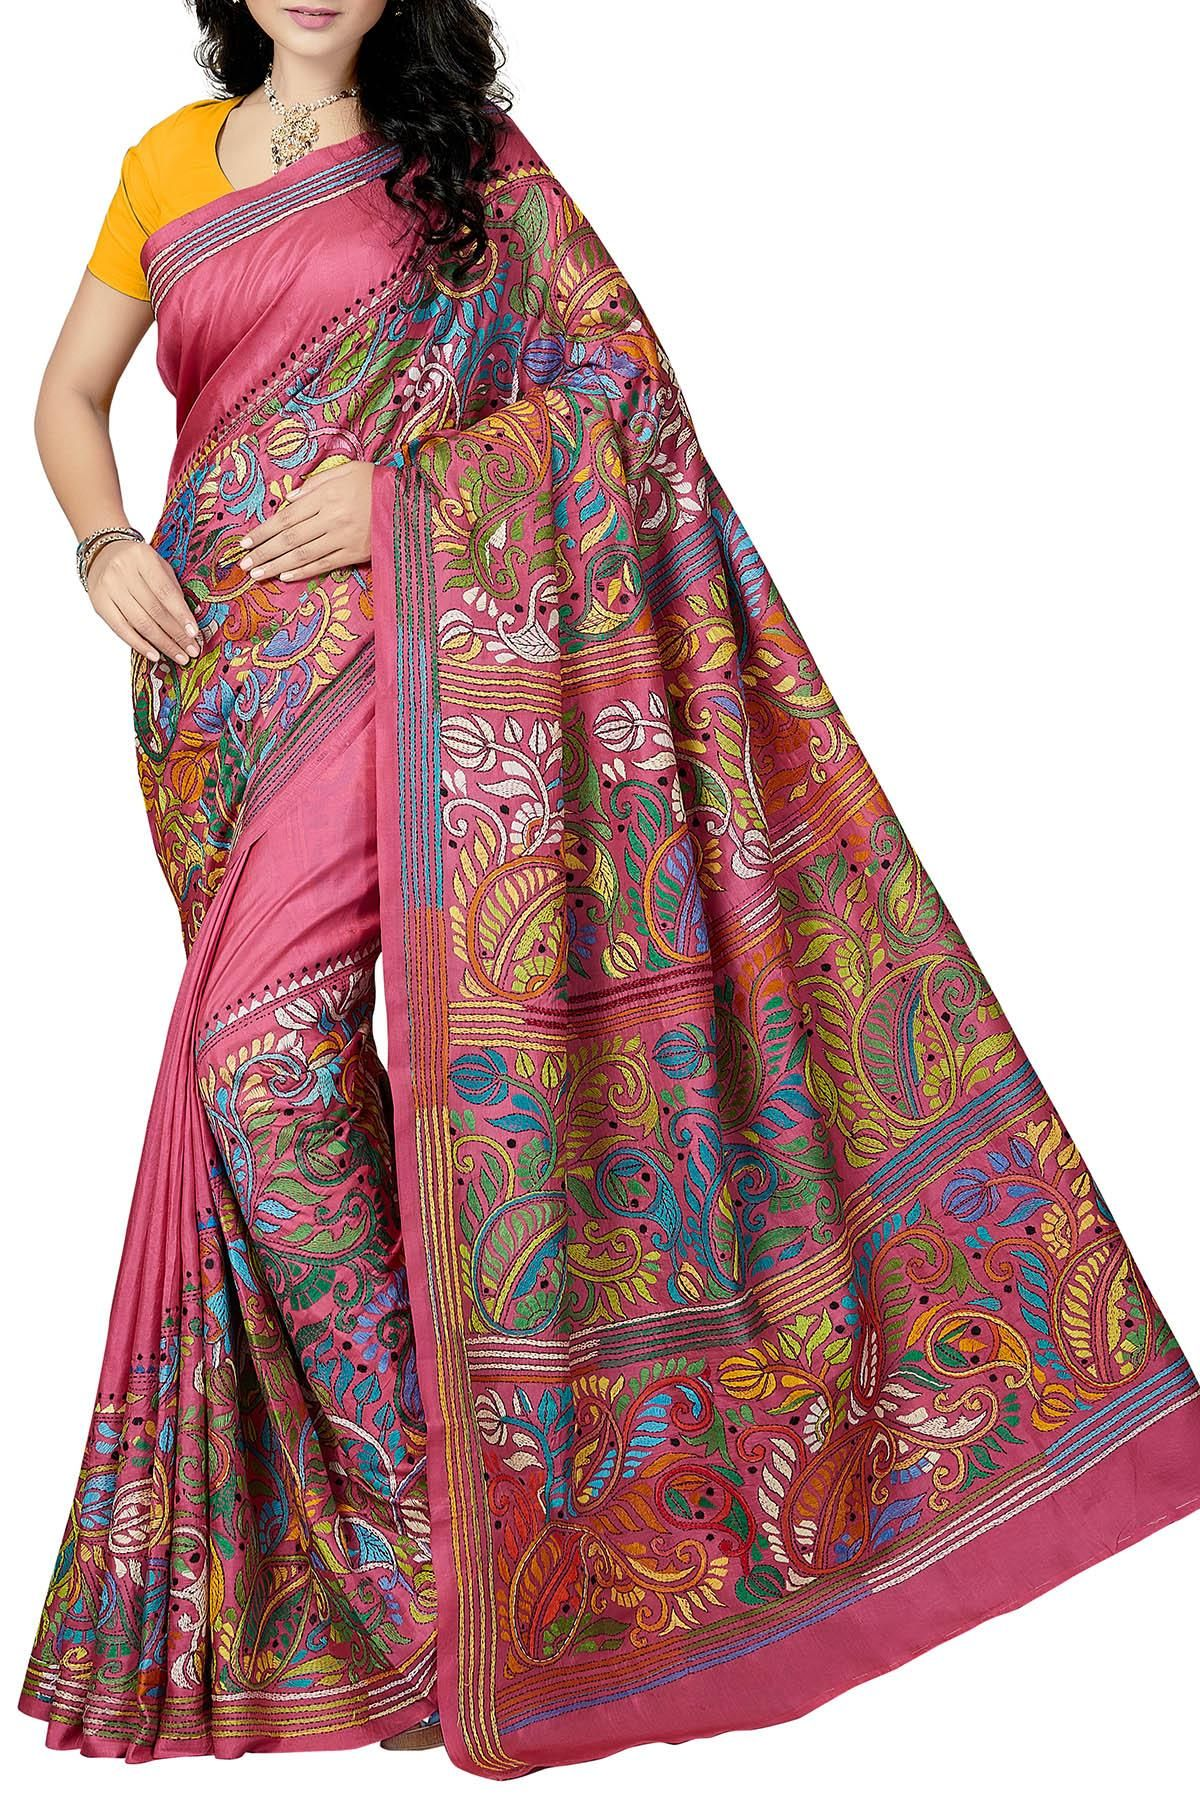 83f88d4f0de Rose Pink   Multi-Colored Floral Paisley Nakshi Kantha Soft Silk Saree